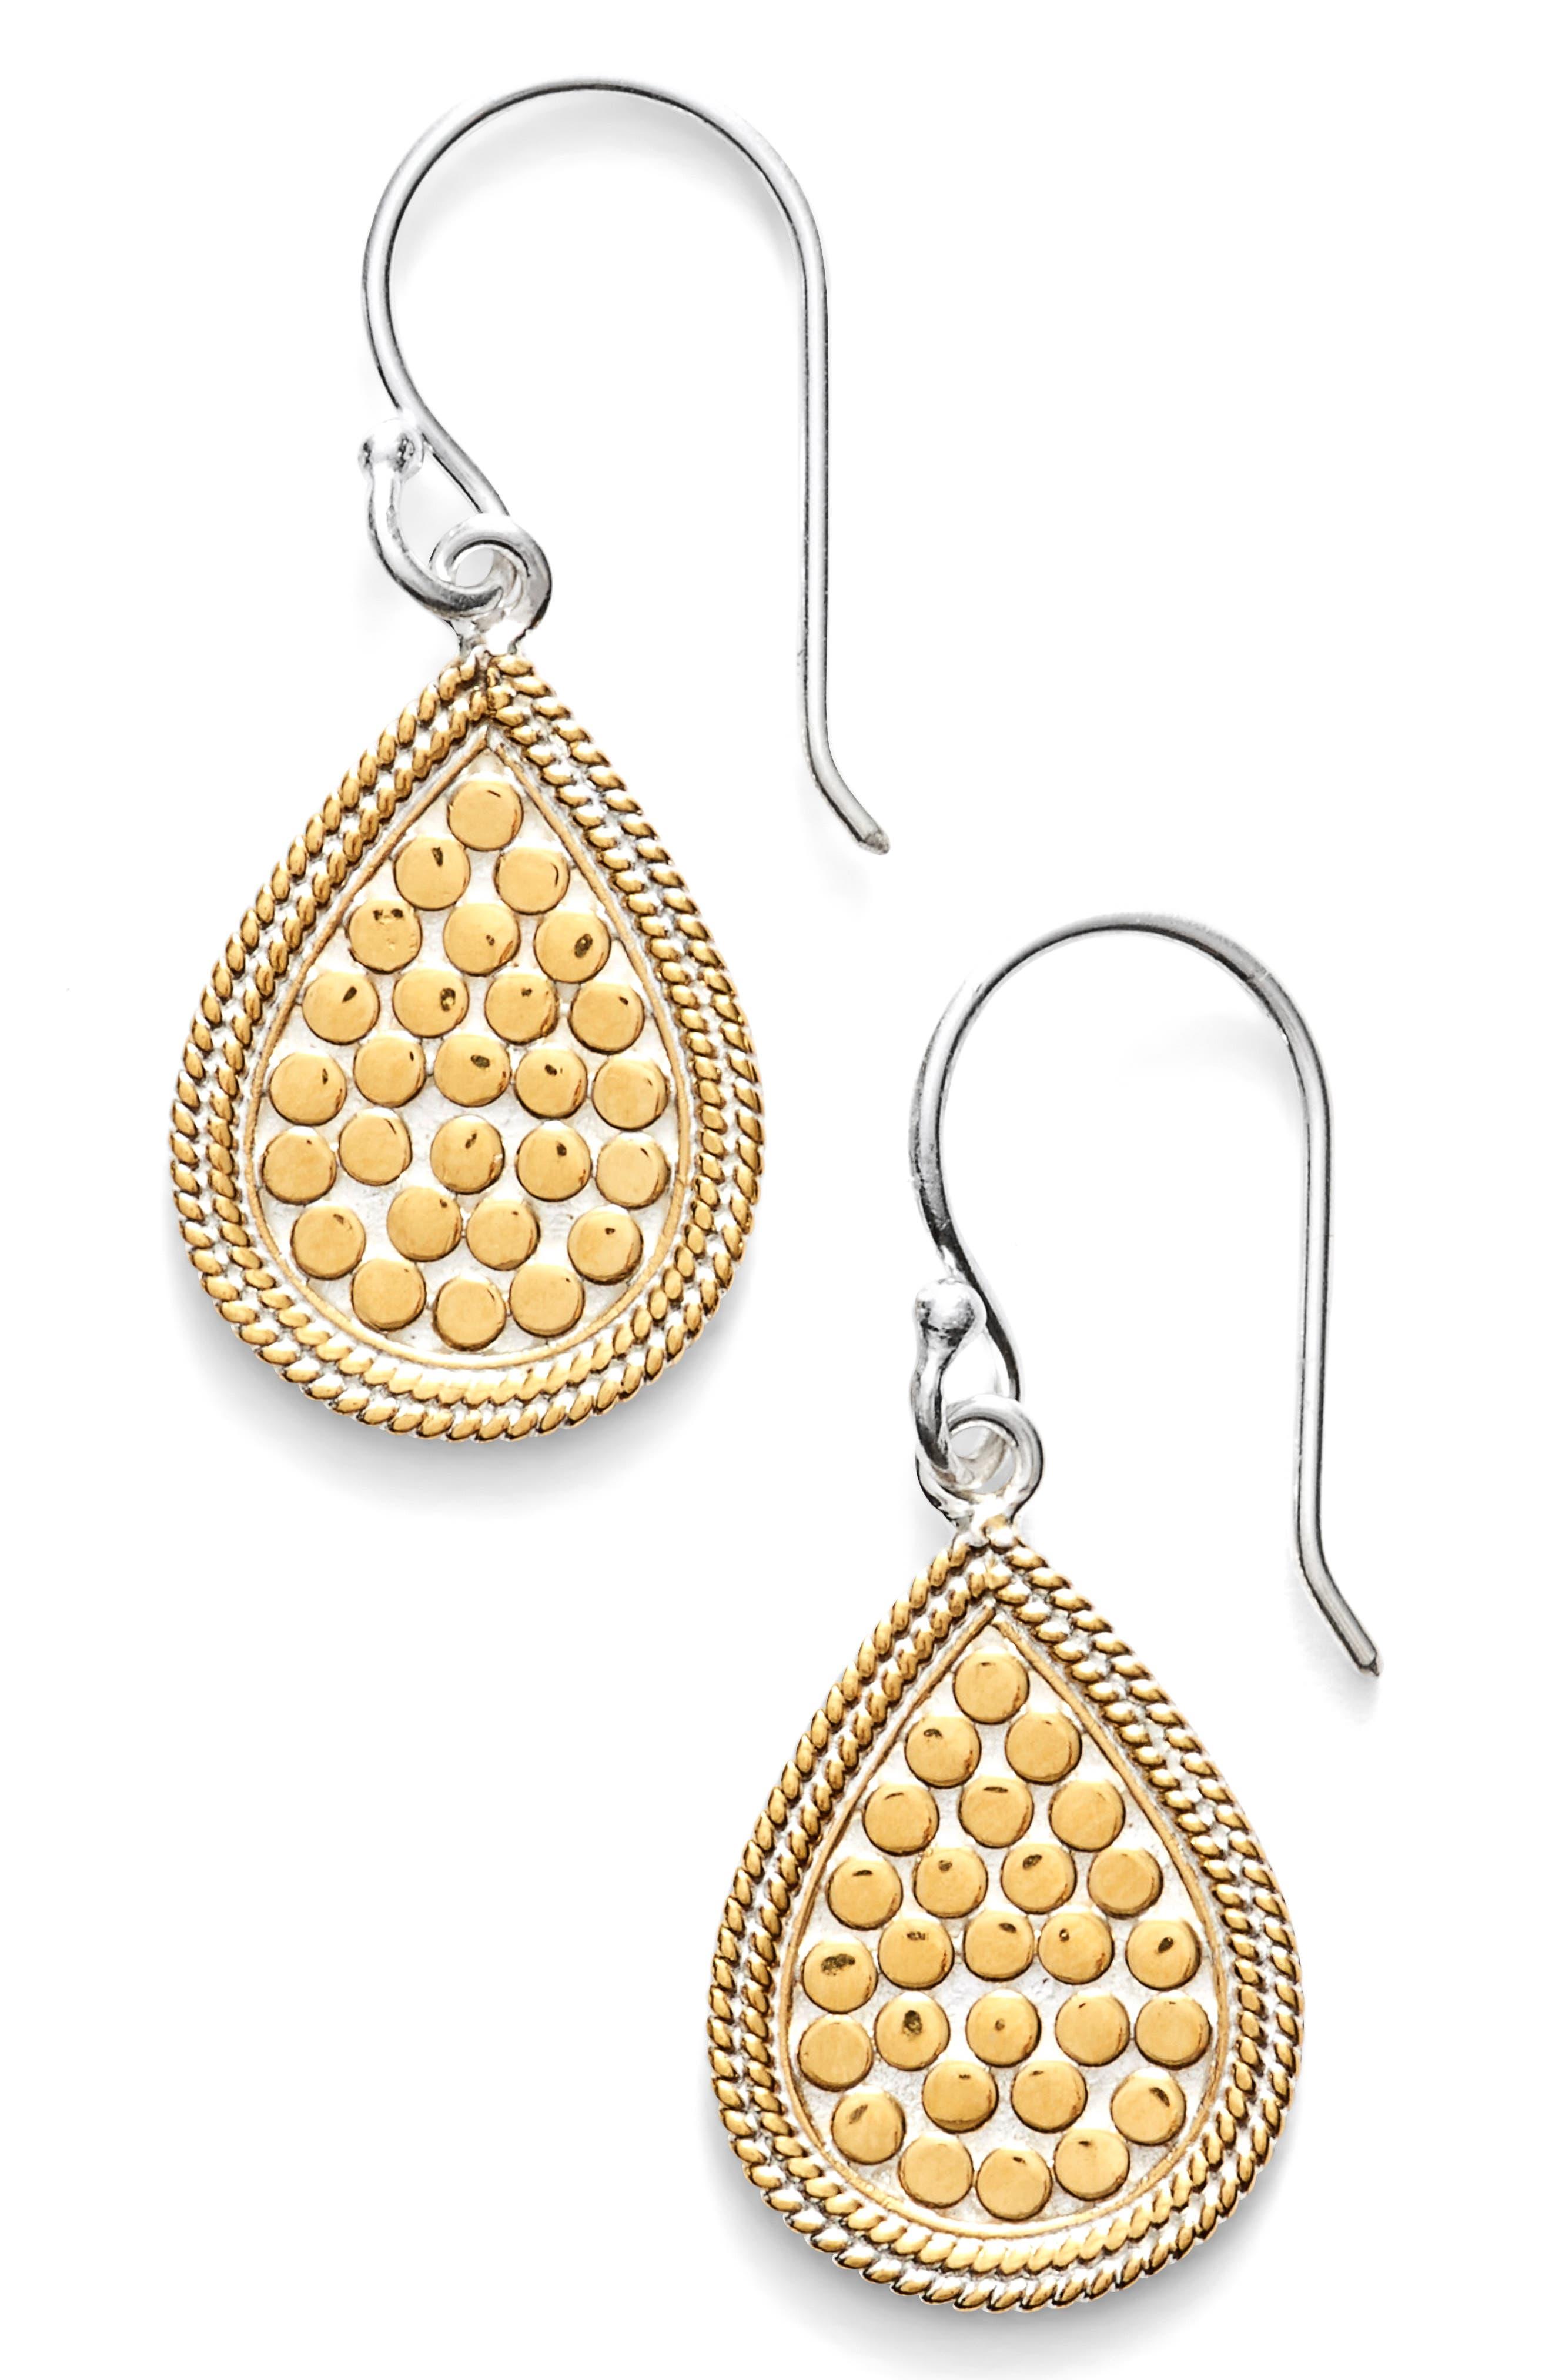 'Gili' Small Teardrop Earrings,                         Main,                         color, GOLD/ SILVER